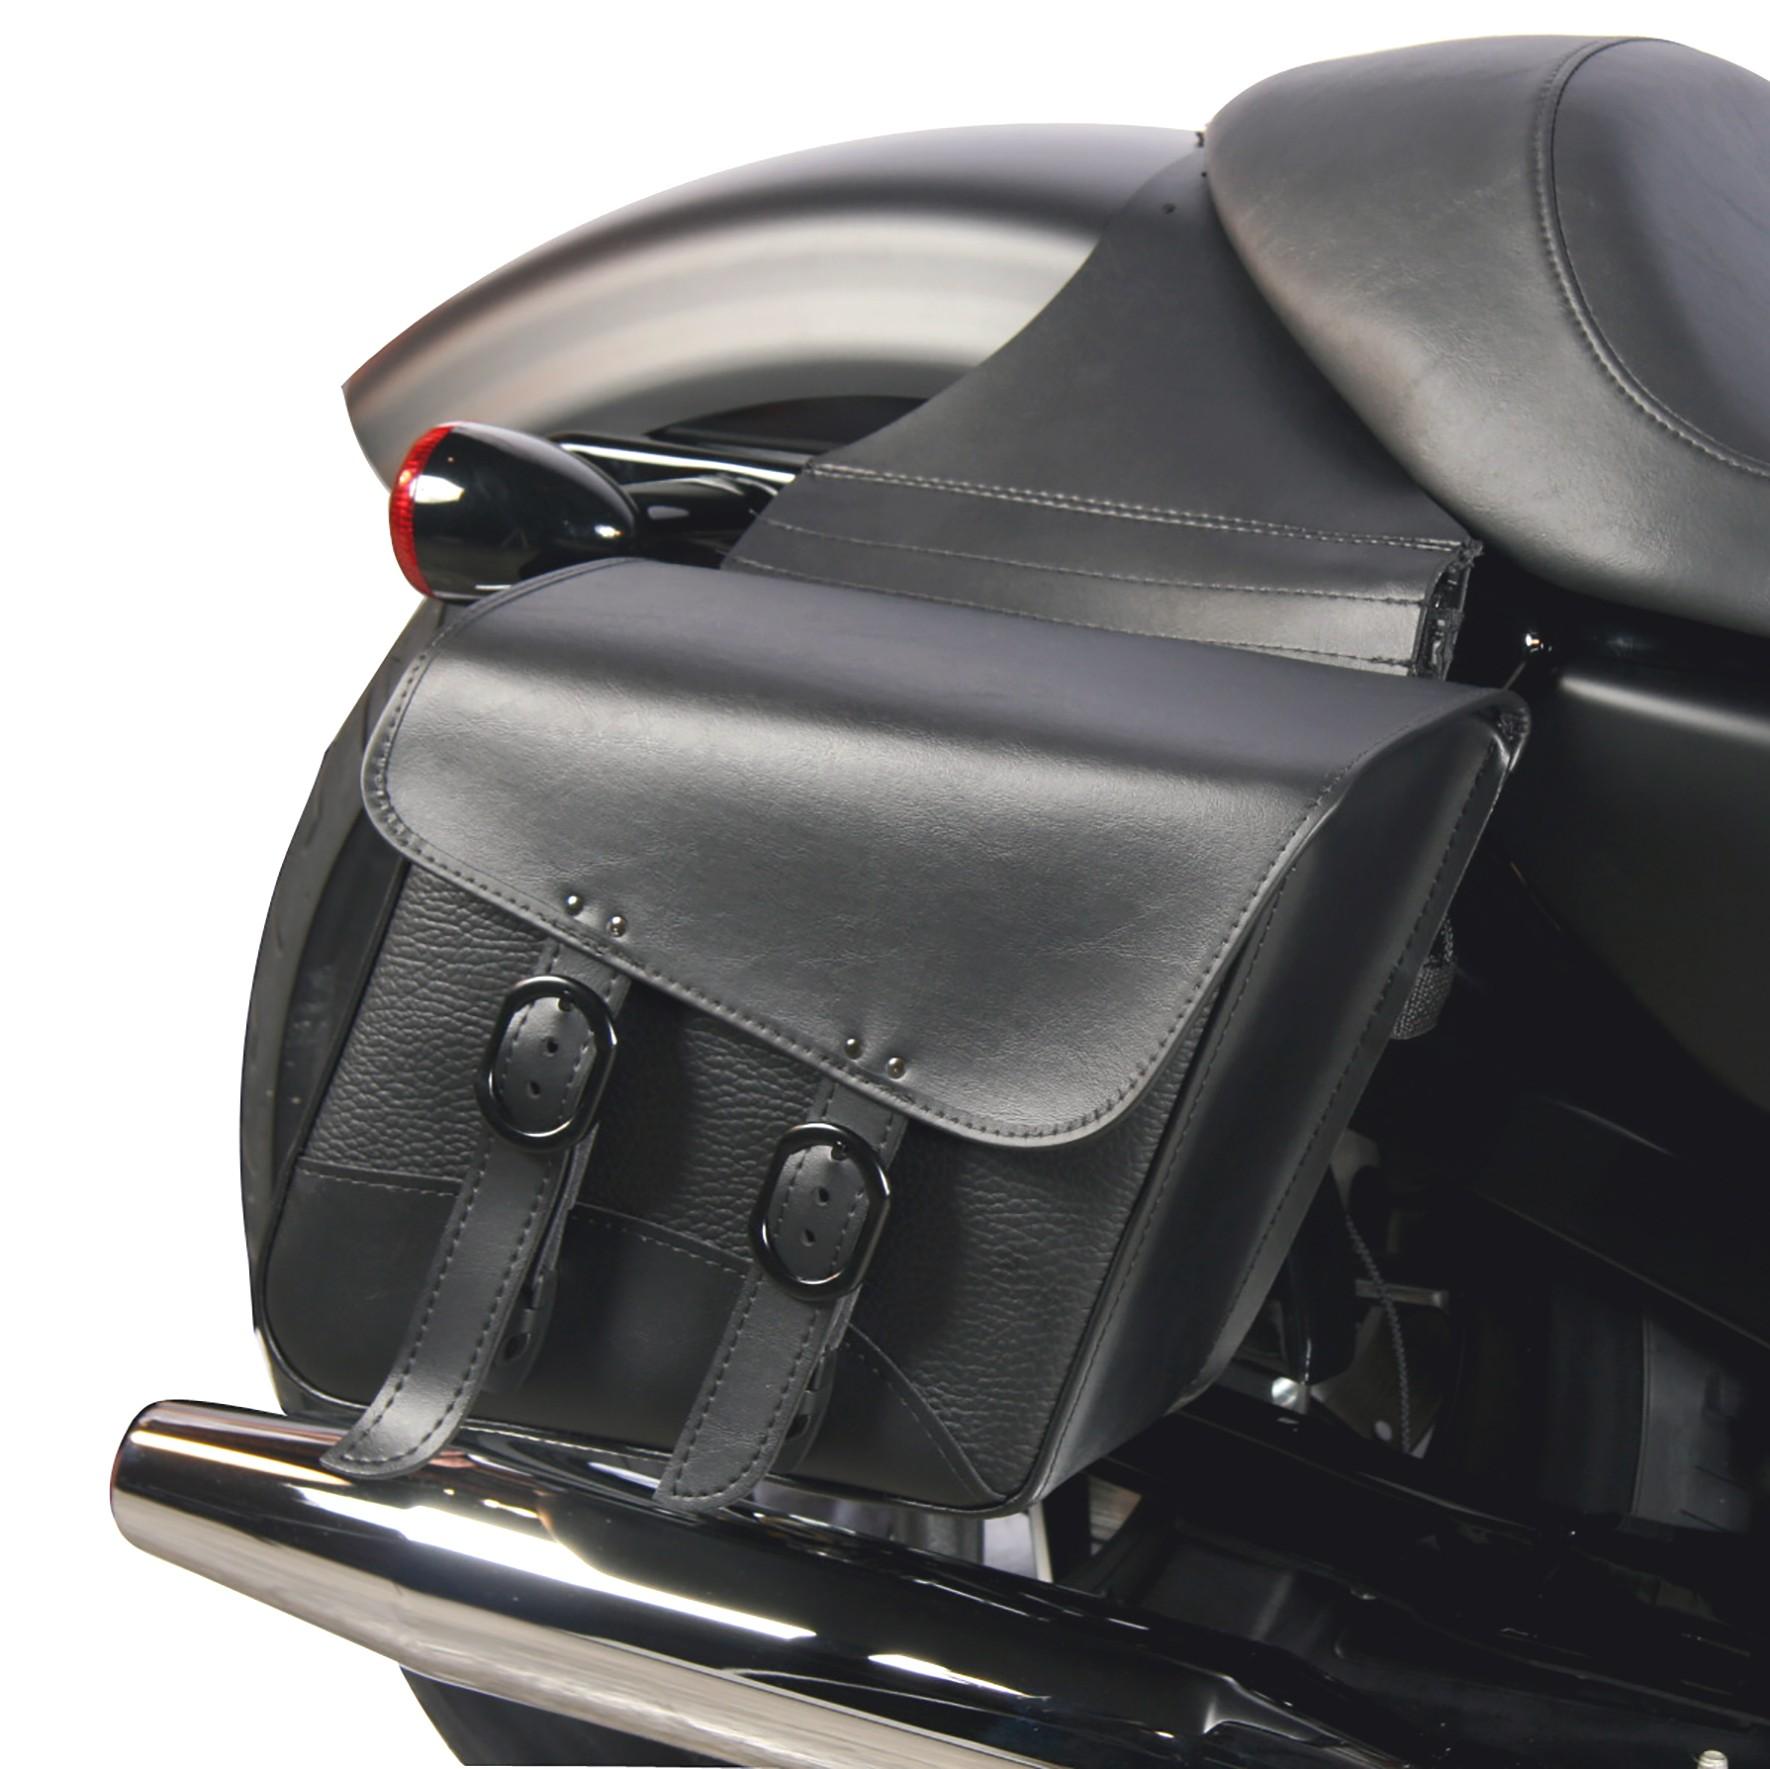 Dowco Willie and Max Blackjack Compact Slant Saddlebags on a Harley-Davidson Sportster XL